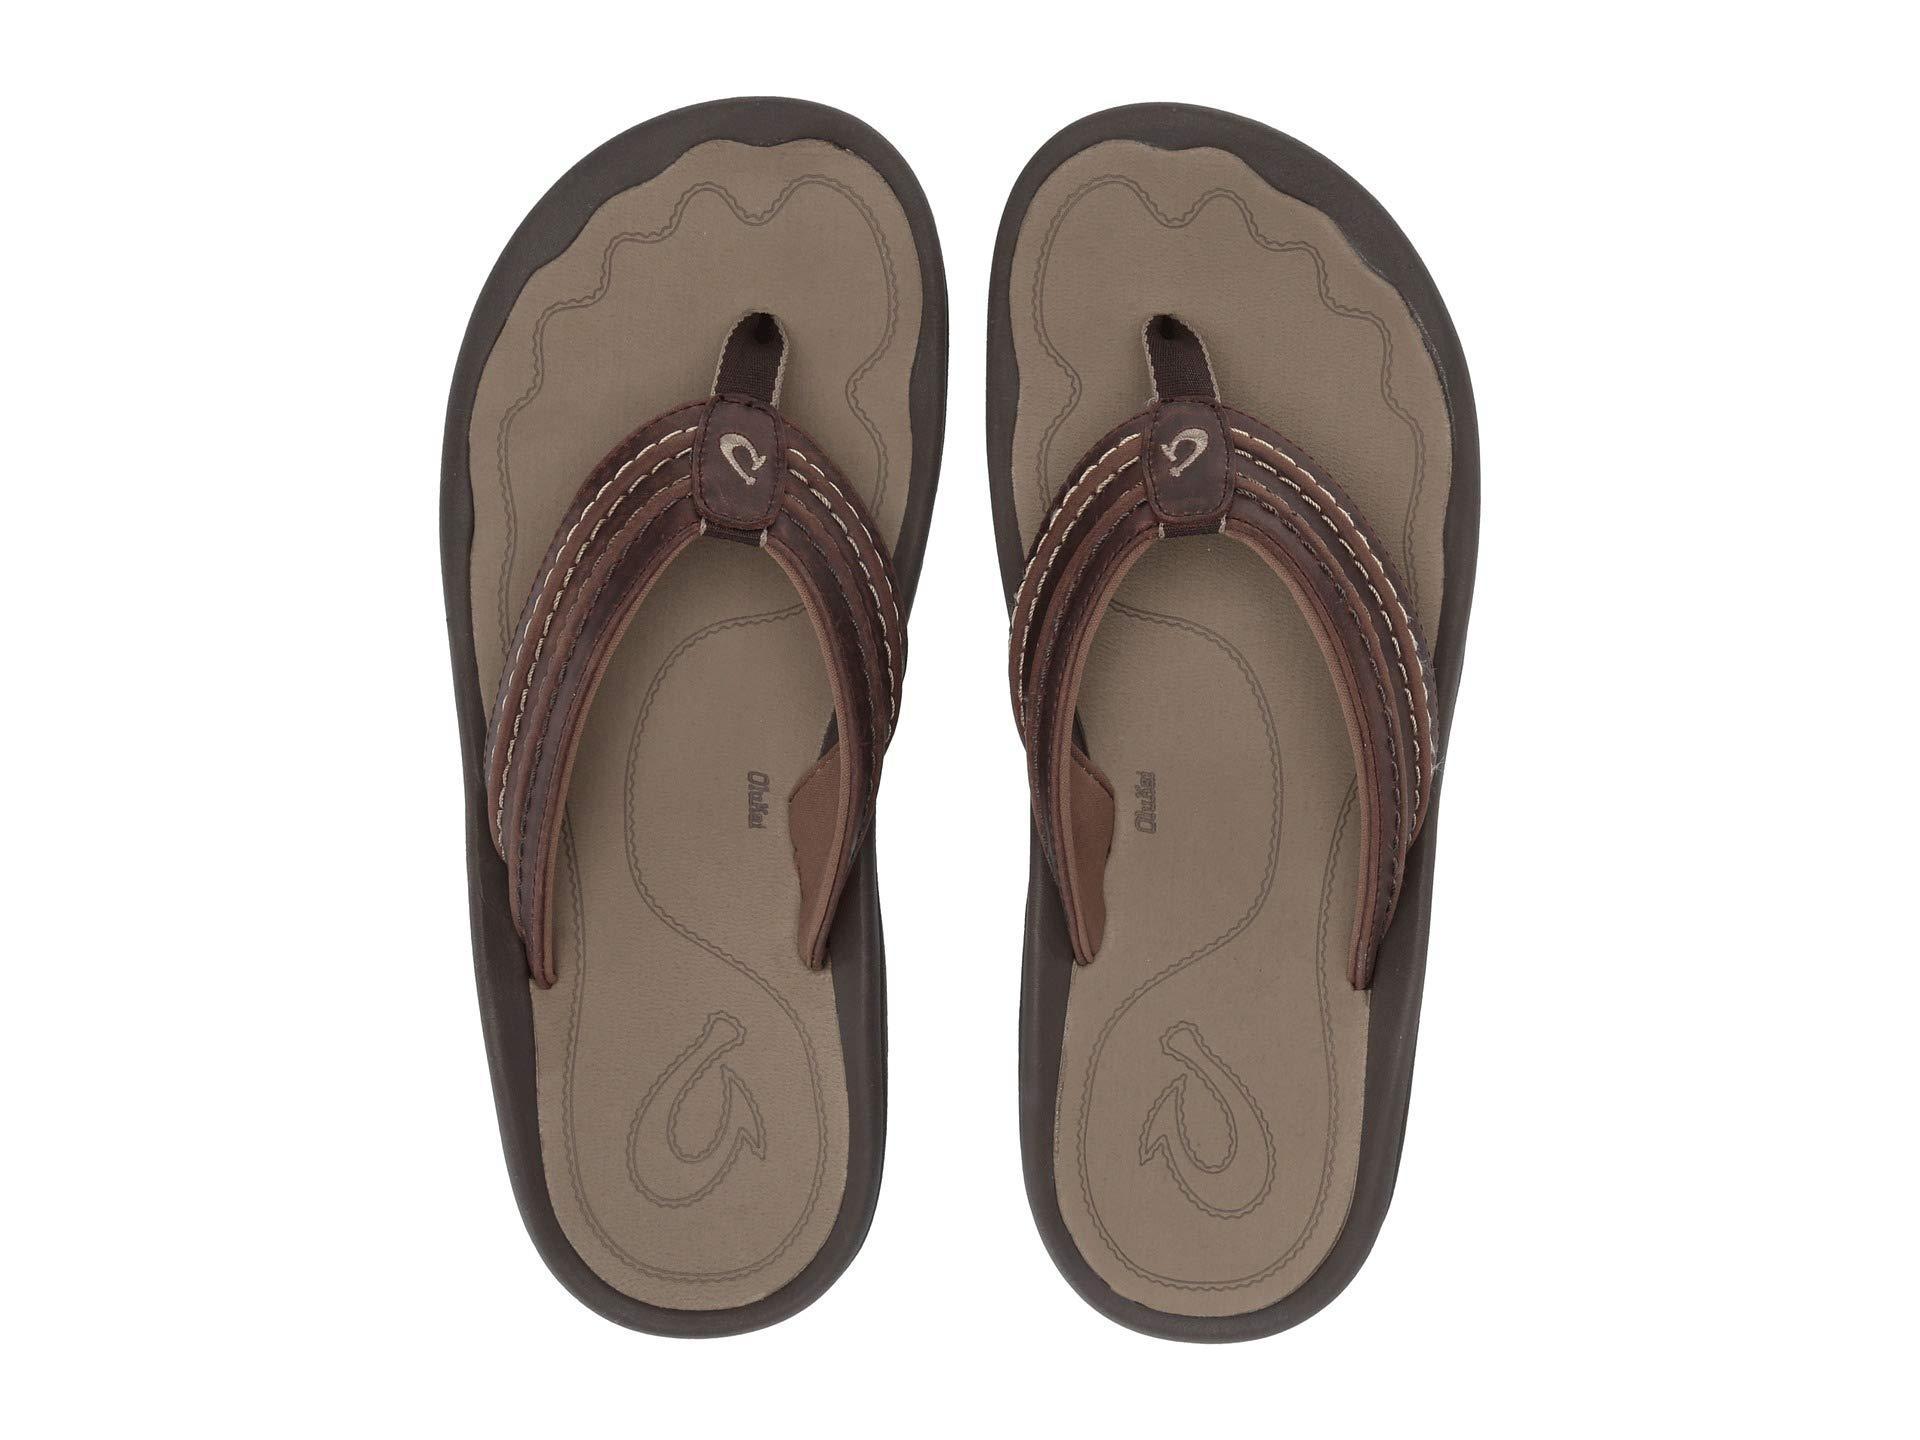 fb0f0babf72 Lyst - Olukai Hokua  ale (black charcoal) Men s Sandals in Brown for Men